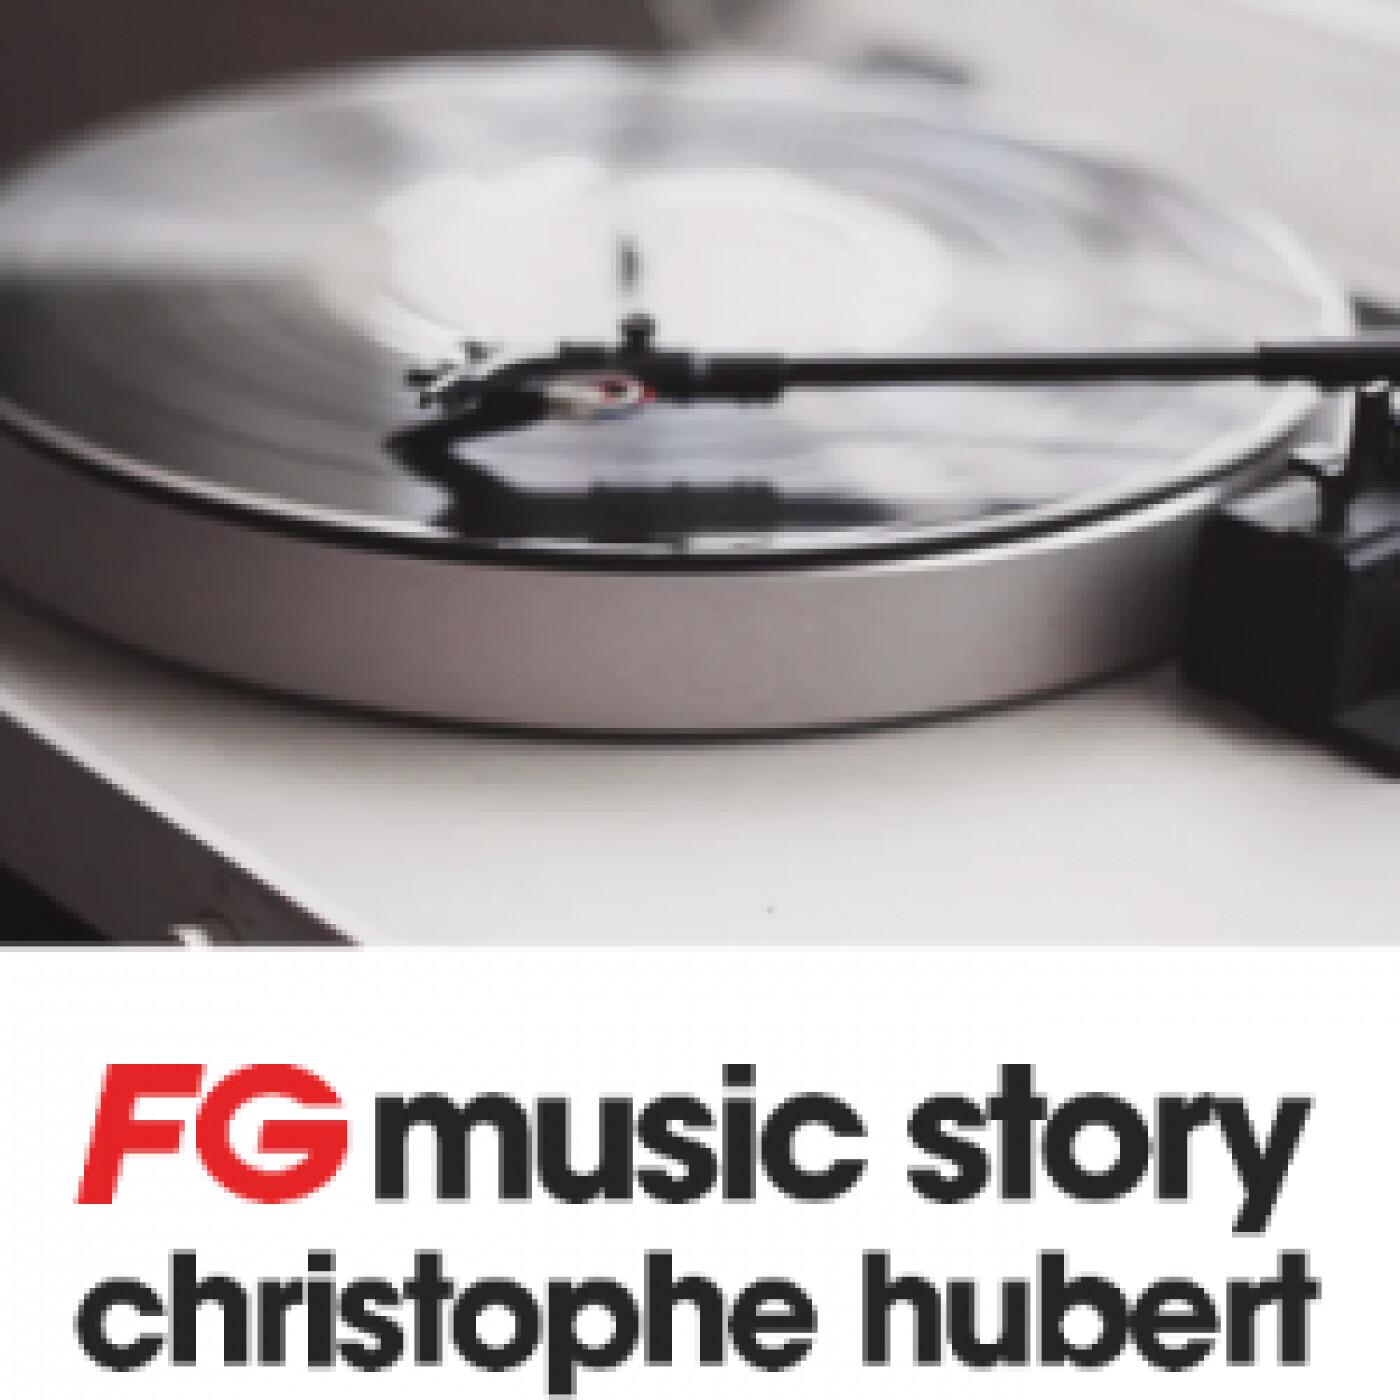 FG MUSIC STORY : ALI LOVE